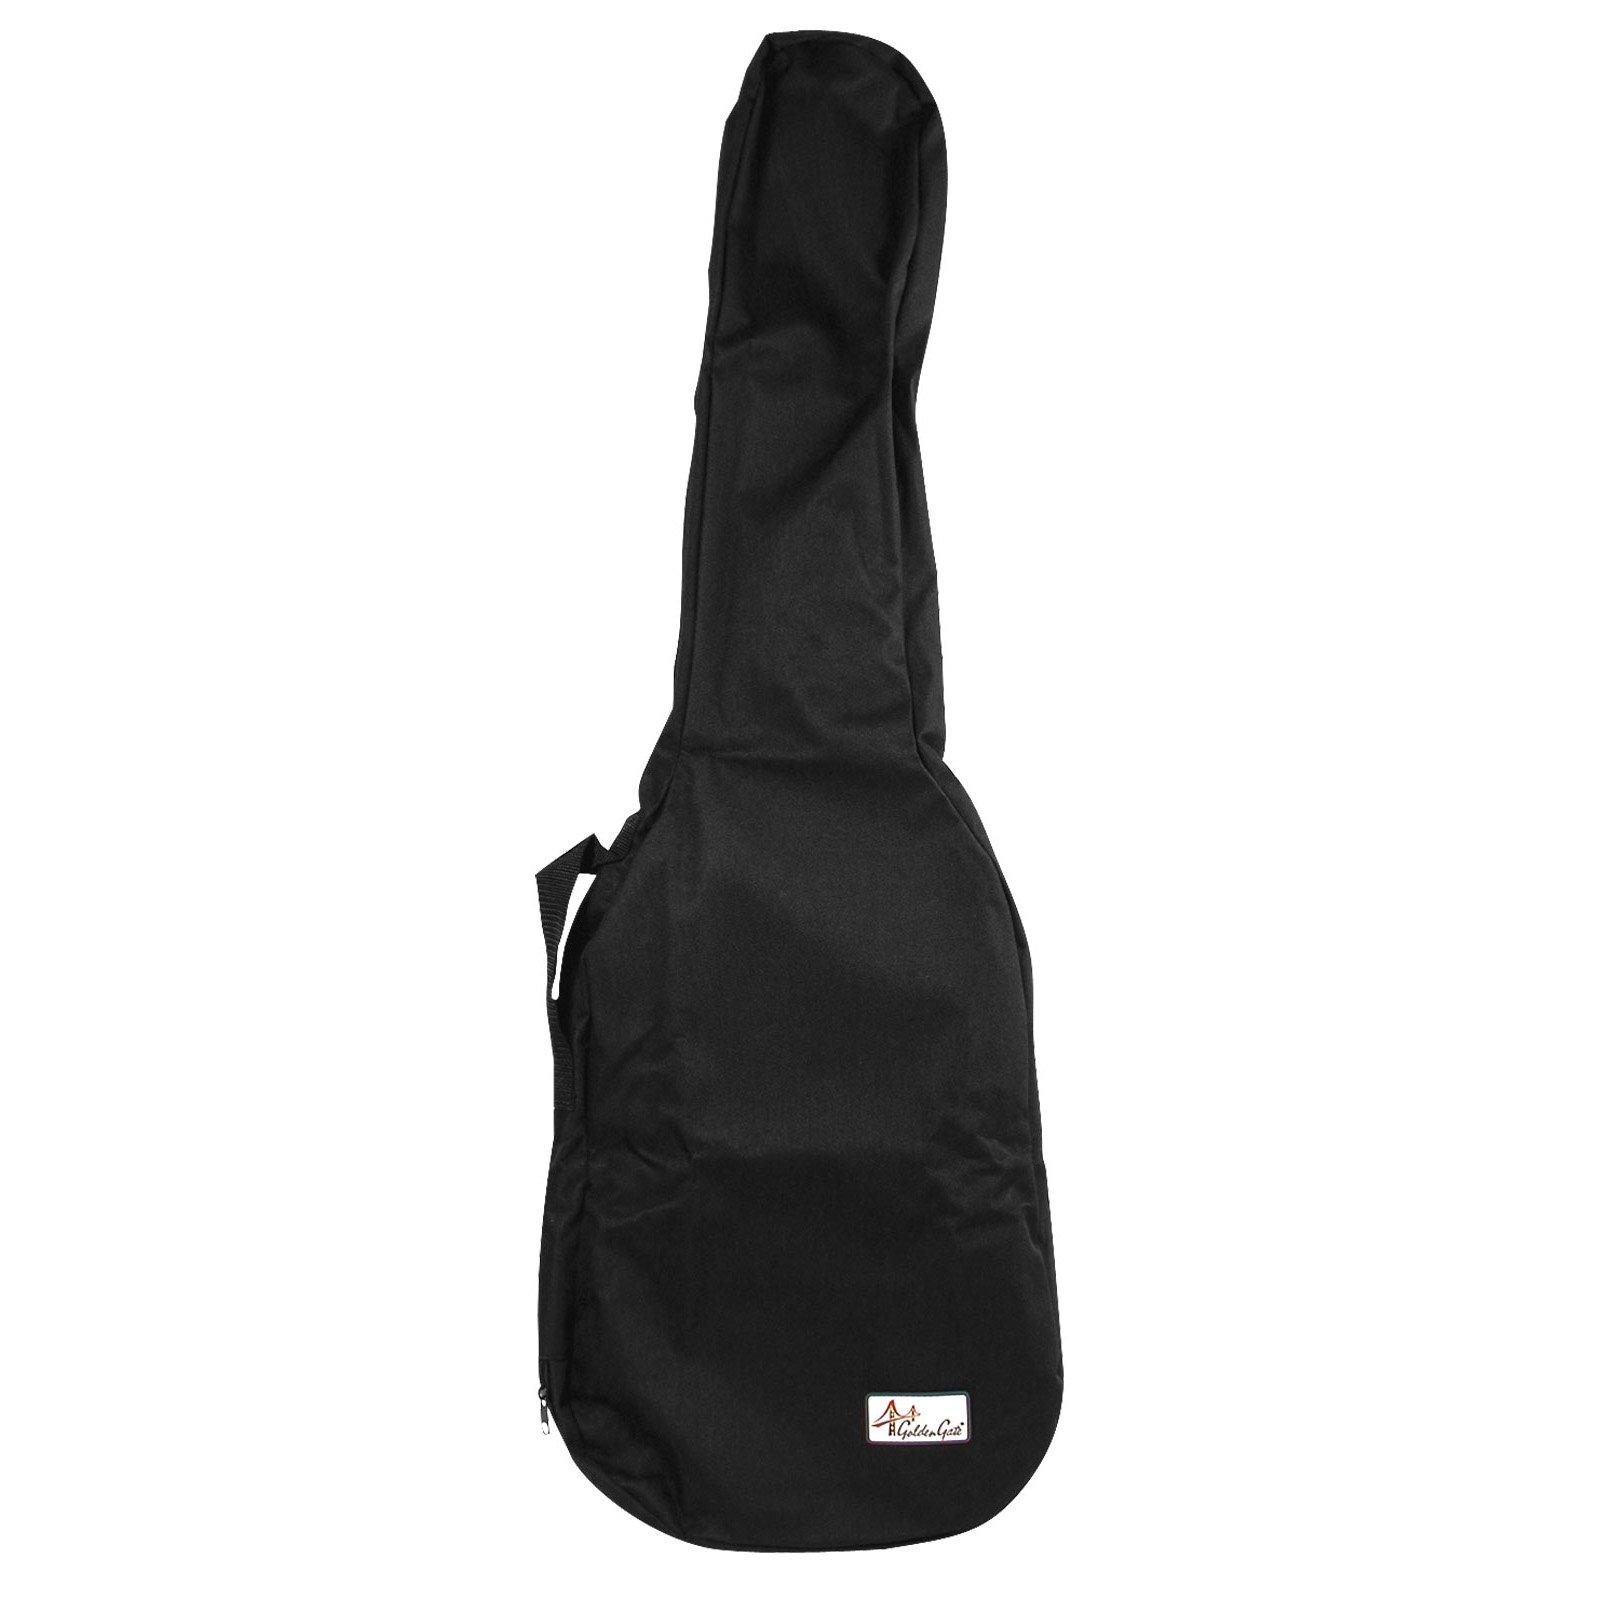 Golden Gate CG-056 Economy Universal Electric Guitar Gig Bag